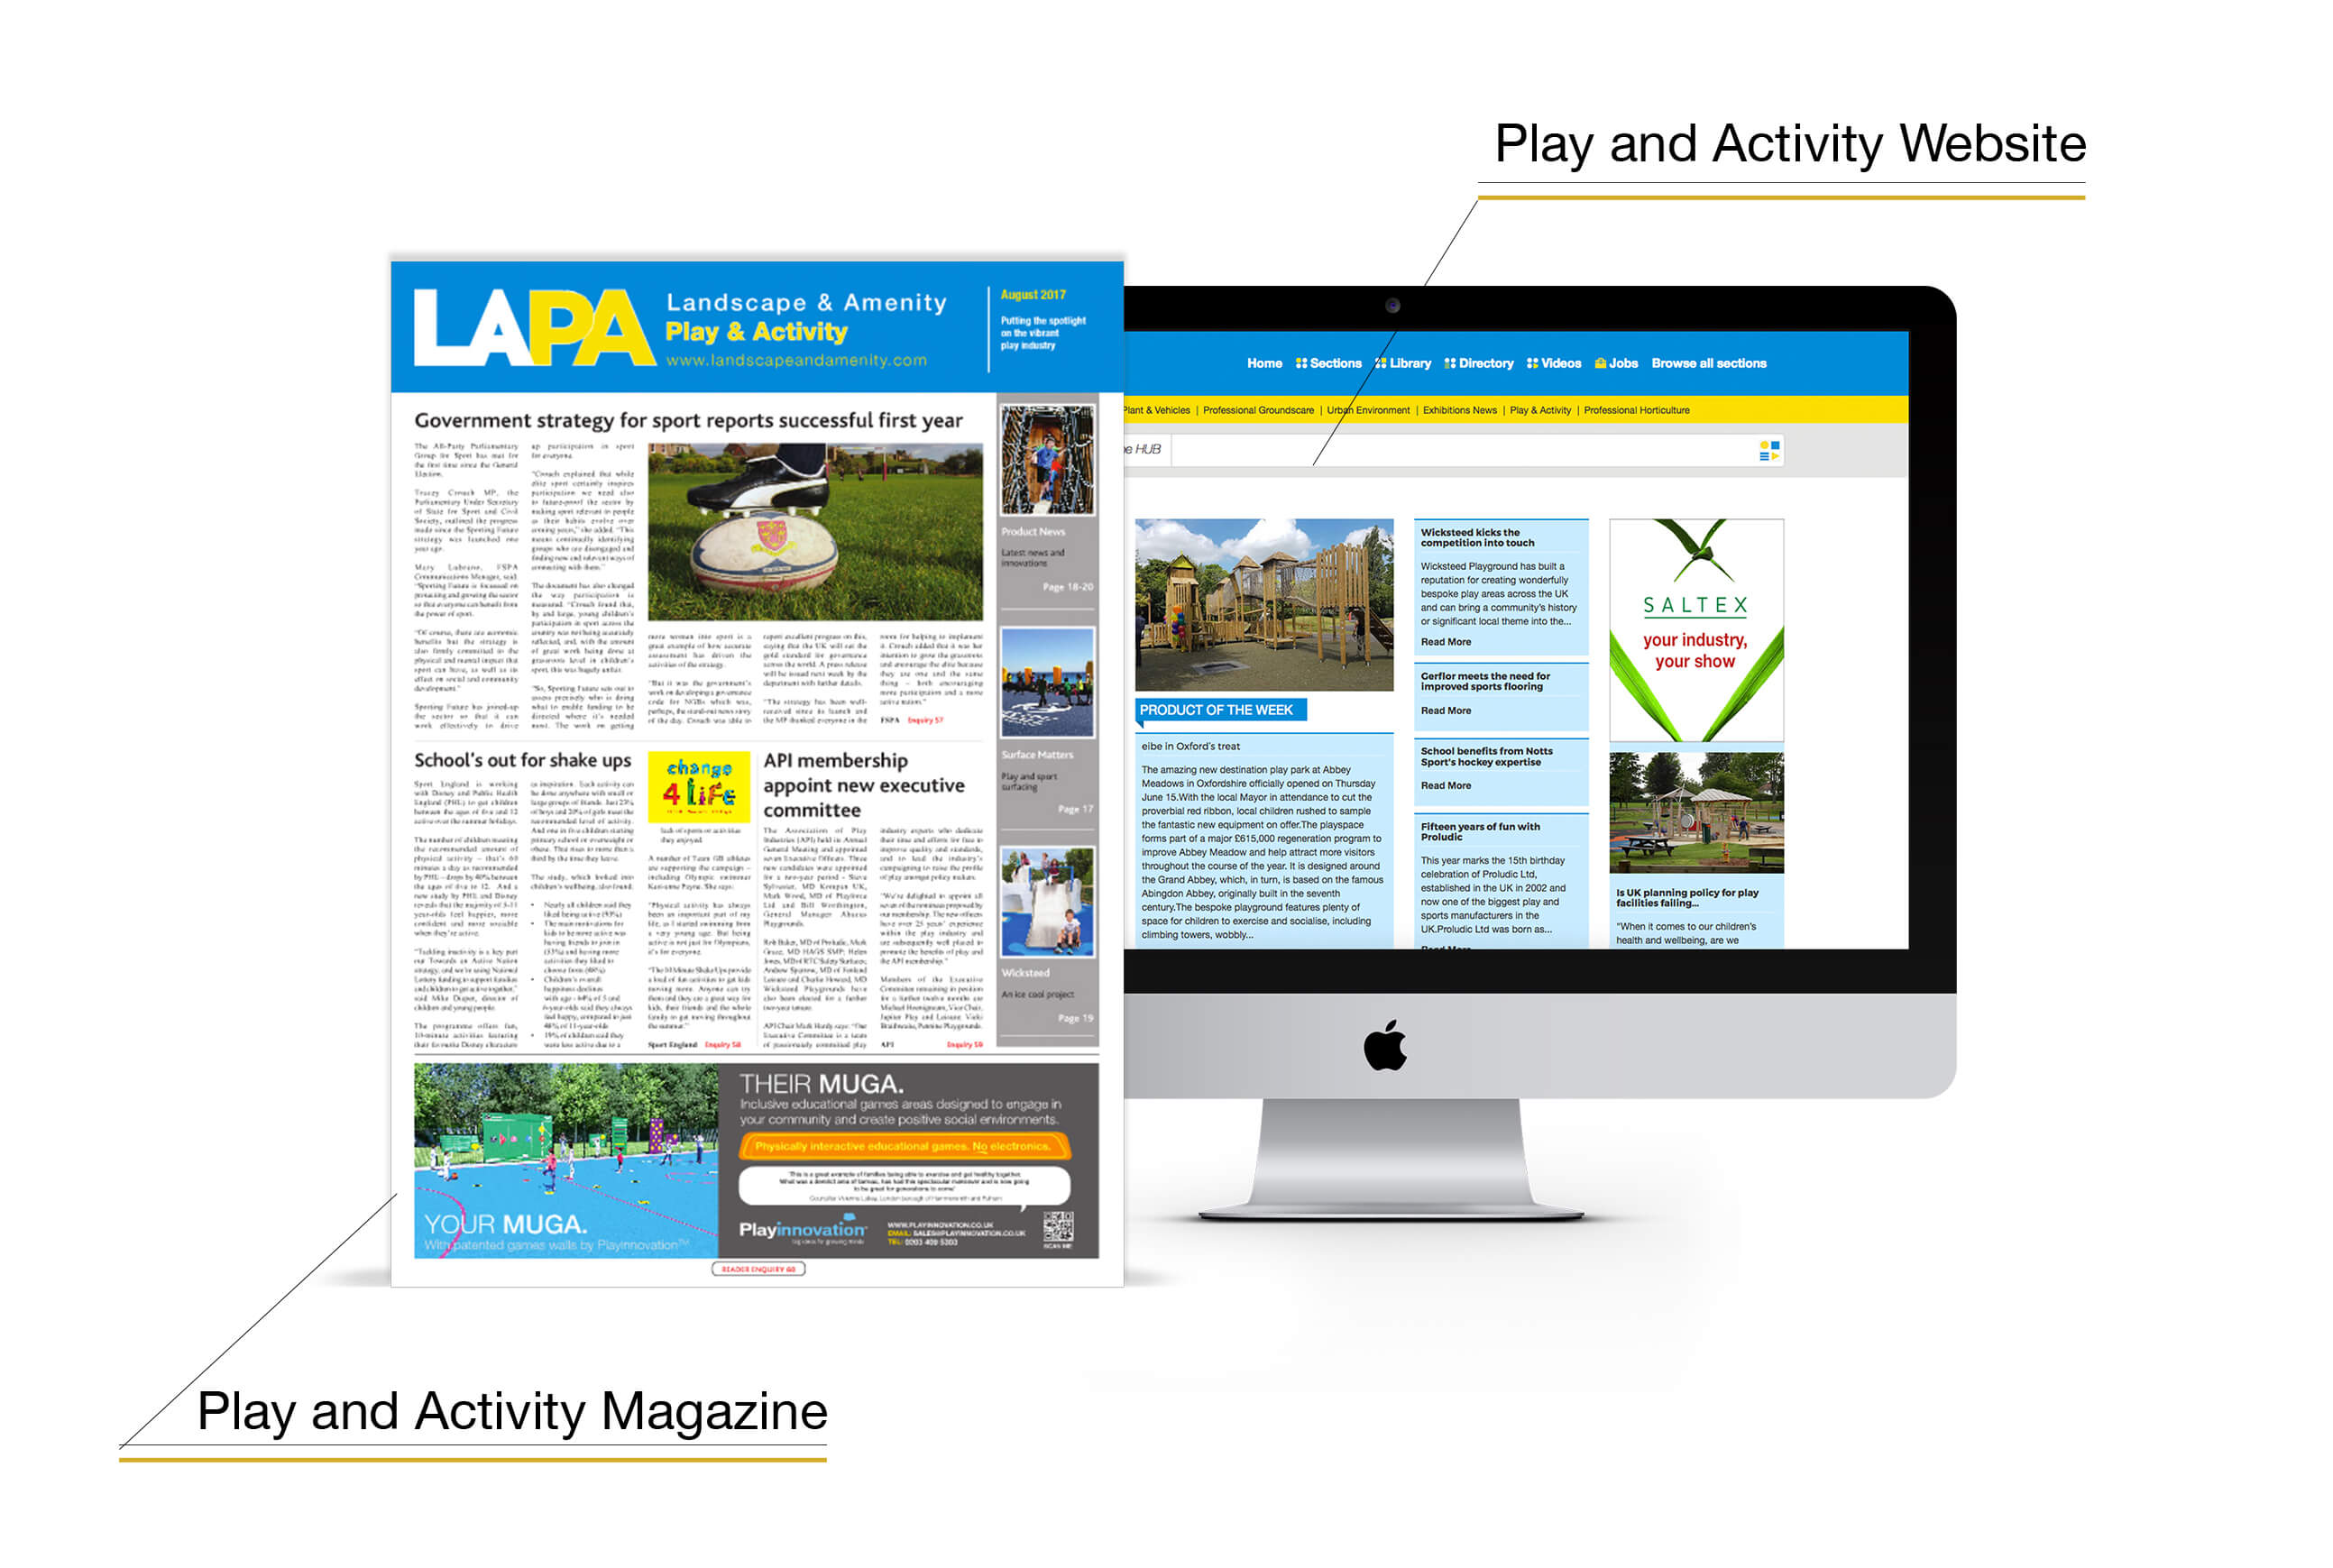 Play & Activity